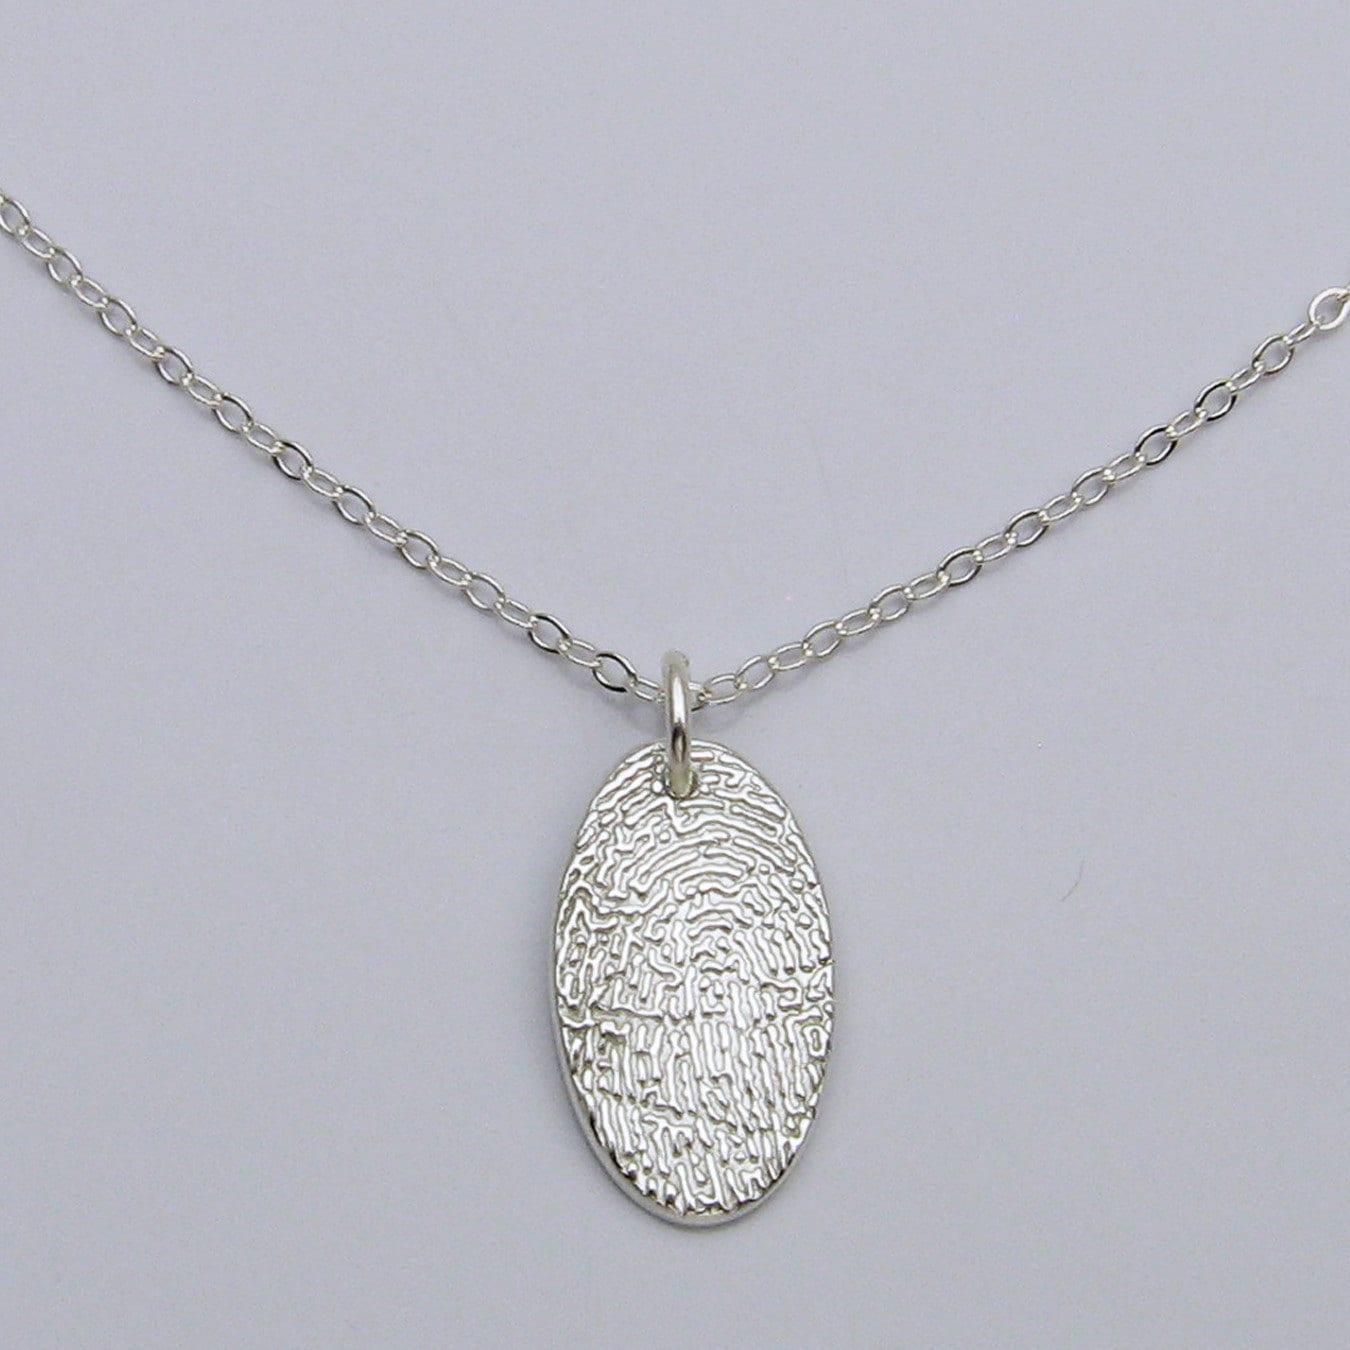 Oval Fingerprint Necklace Silver Fingerprint Necklace